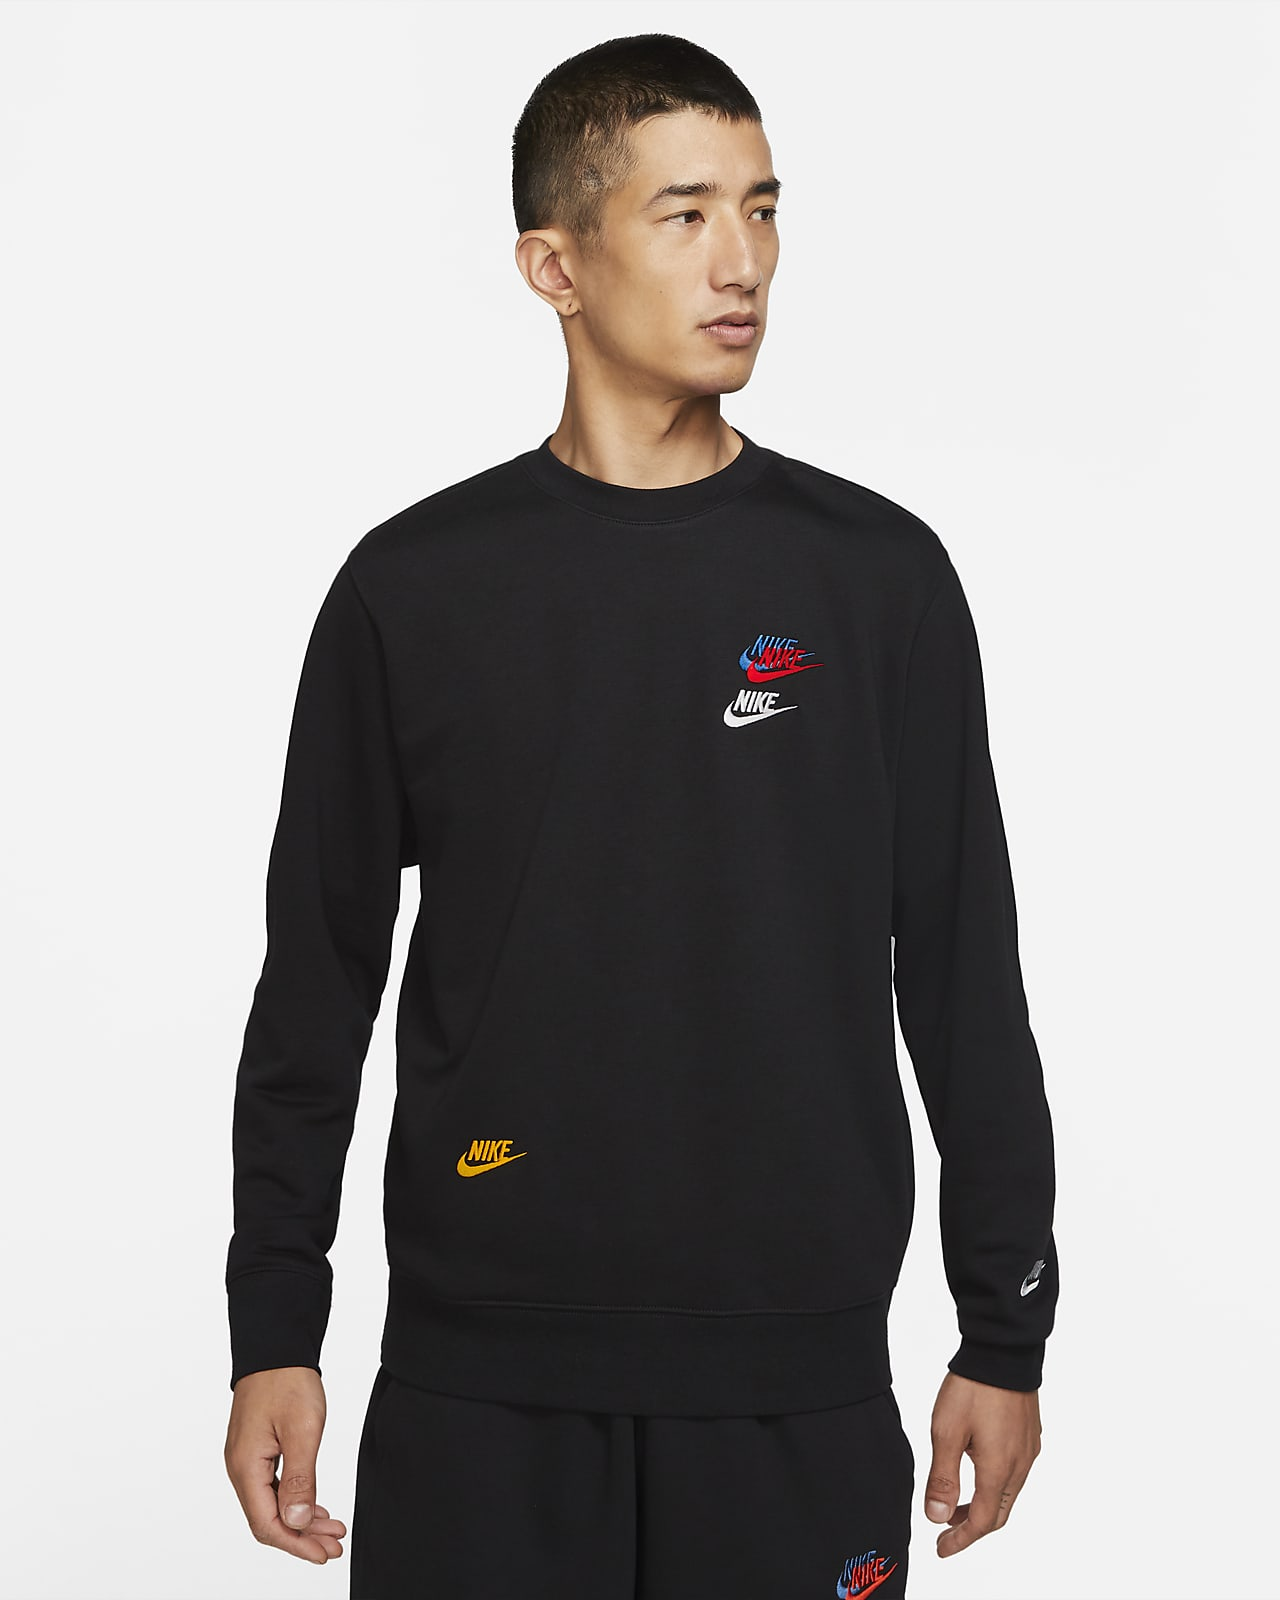 Nike Sportswear Essentials+ Men's French Terry Crew